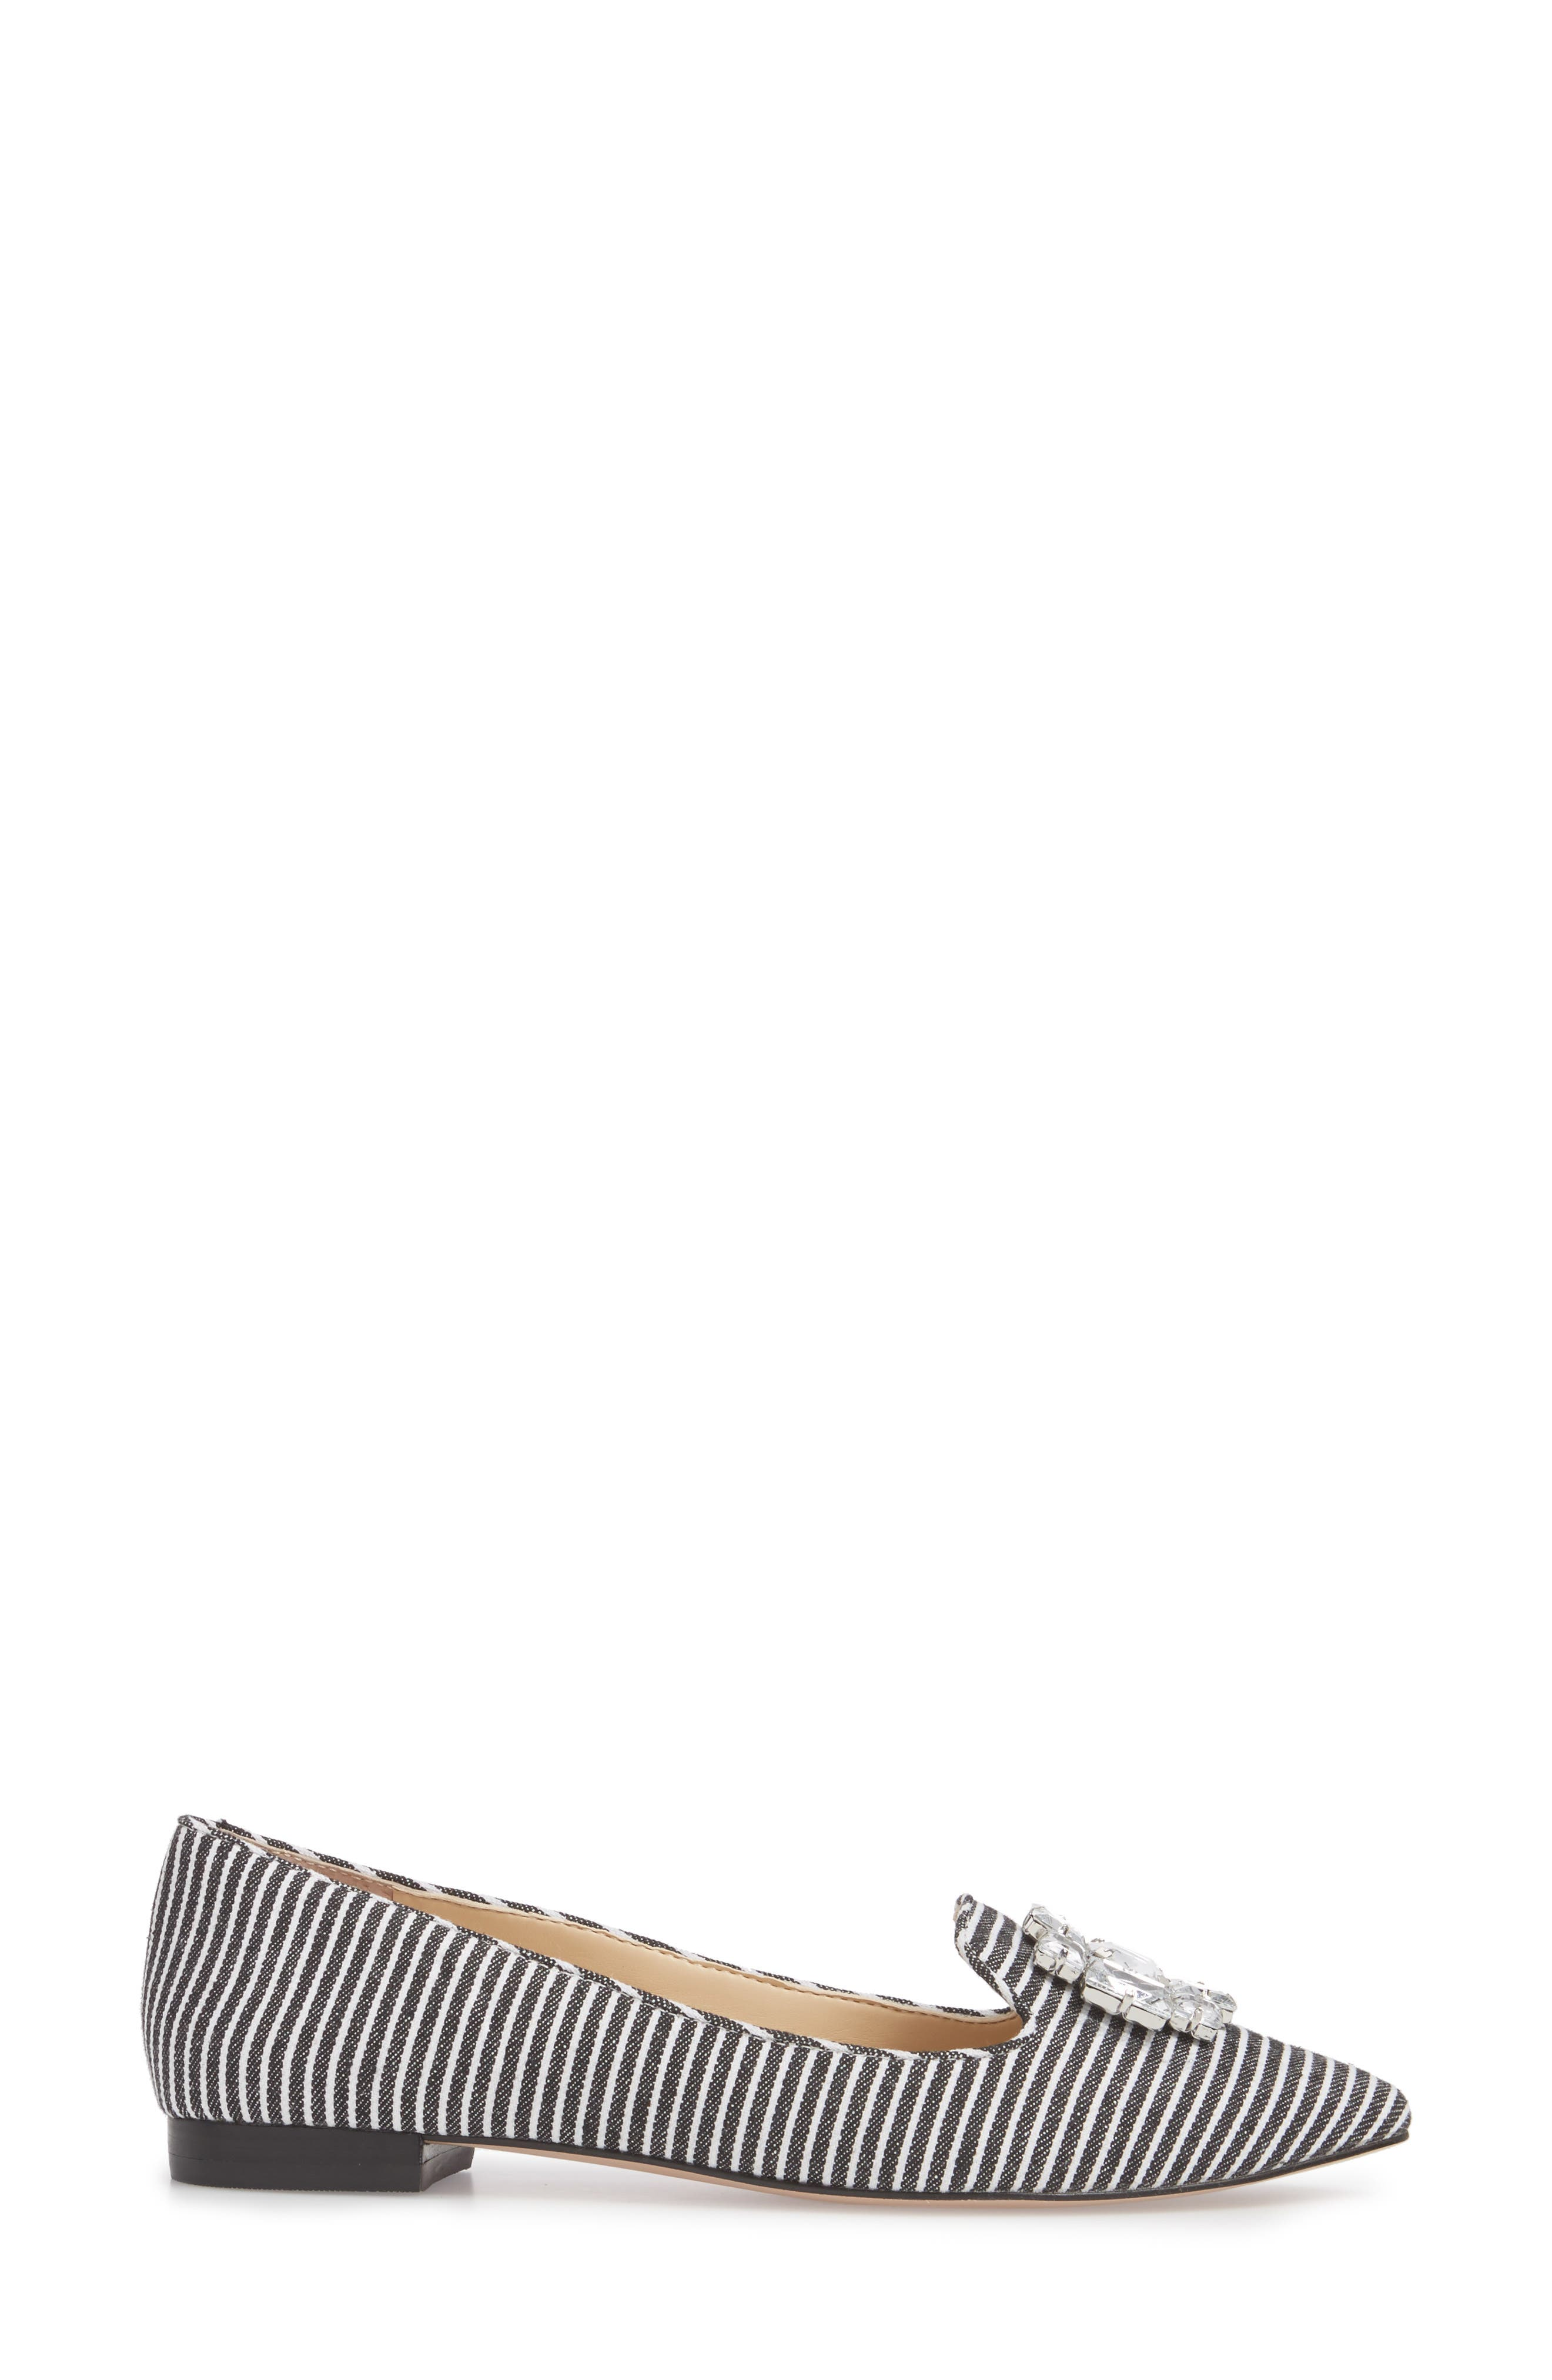 Libry Crystal Embellished Flat,                             Alternate thumbnail 3, color,                             Black/ White Fabric